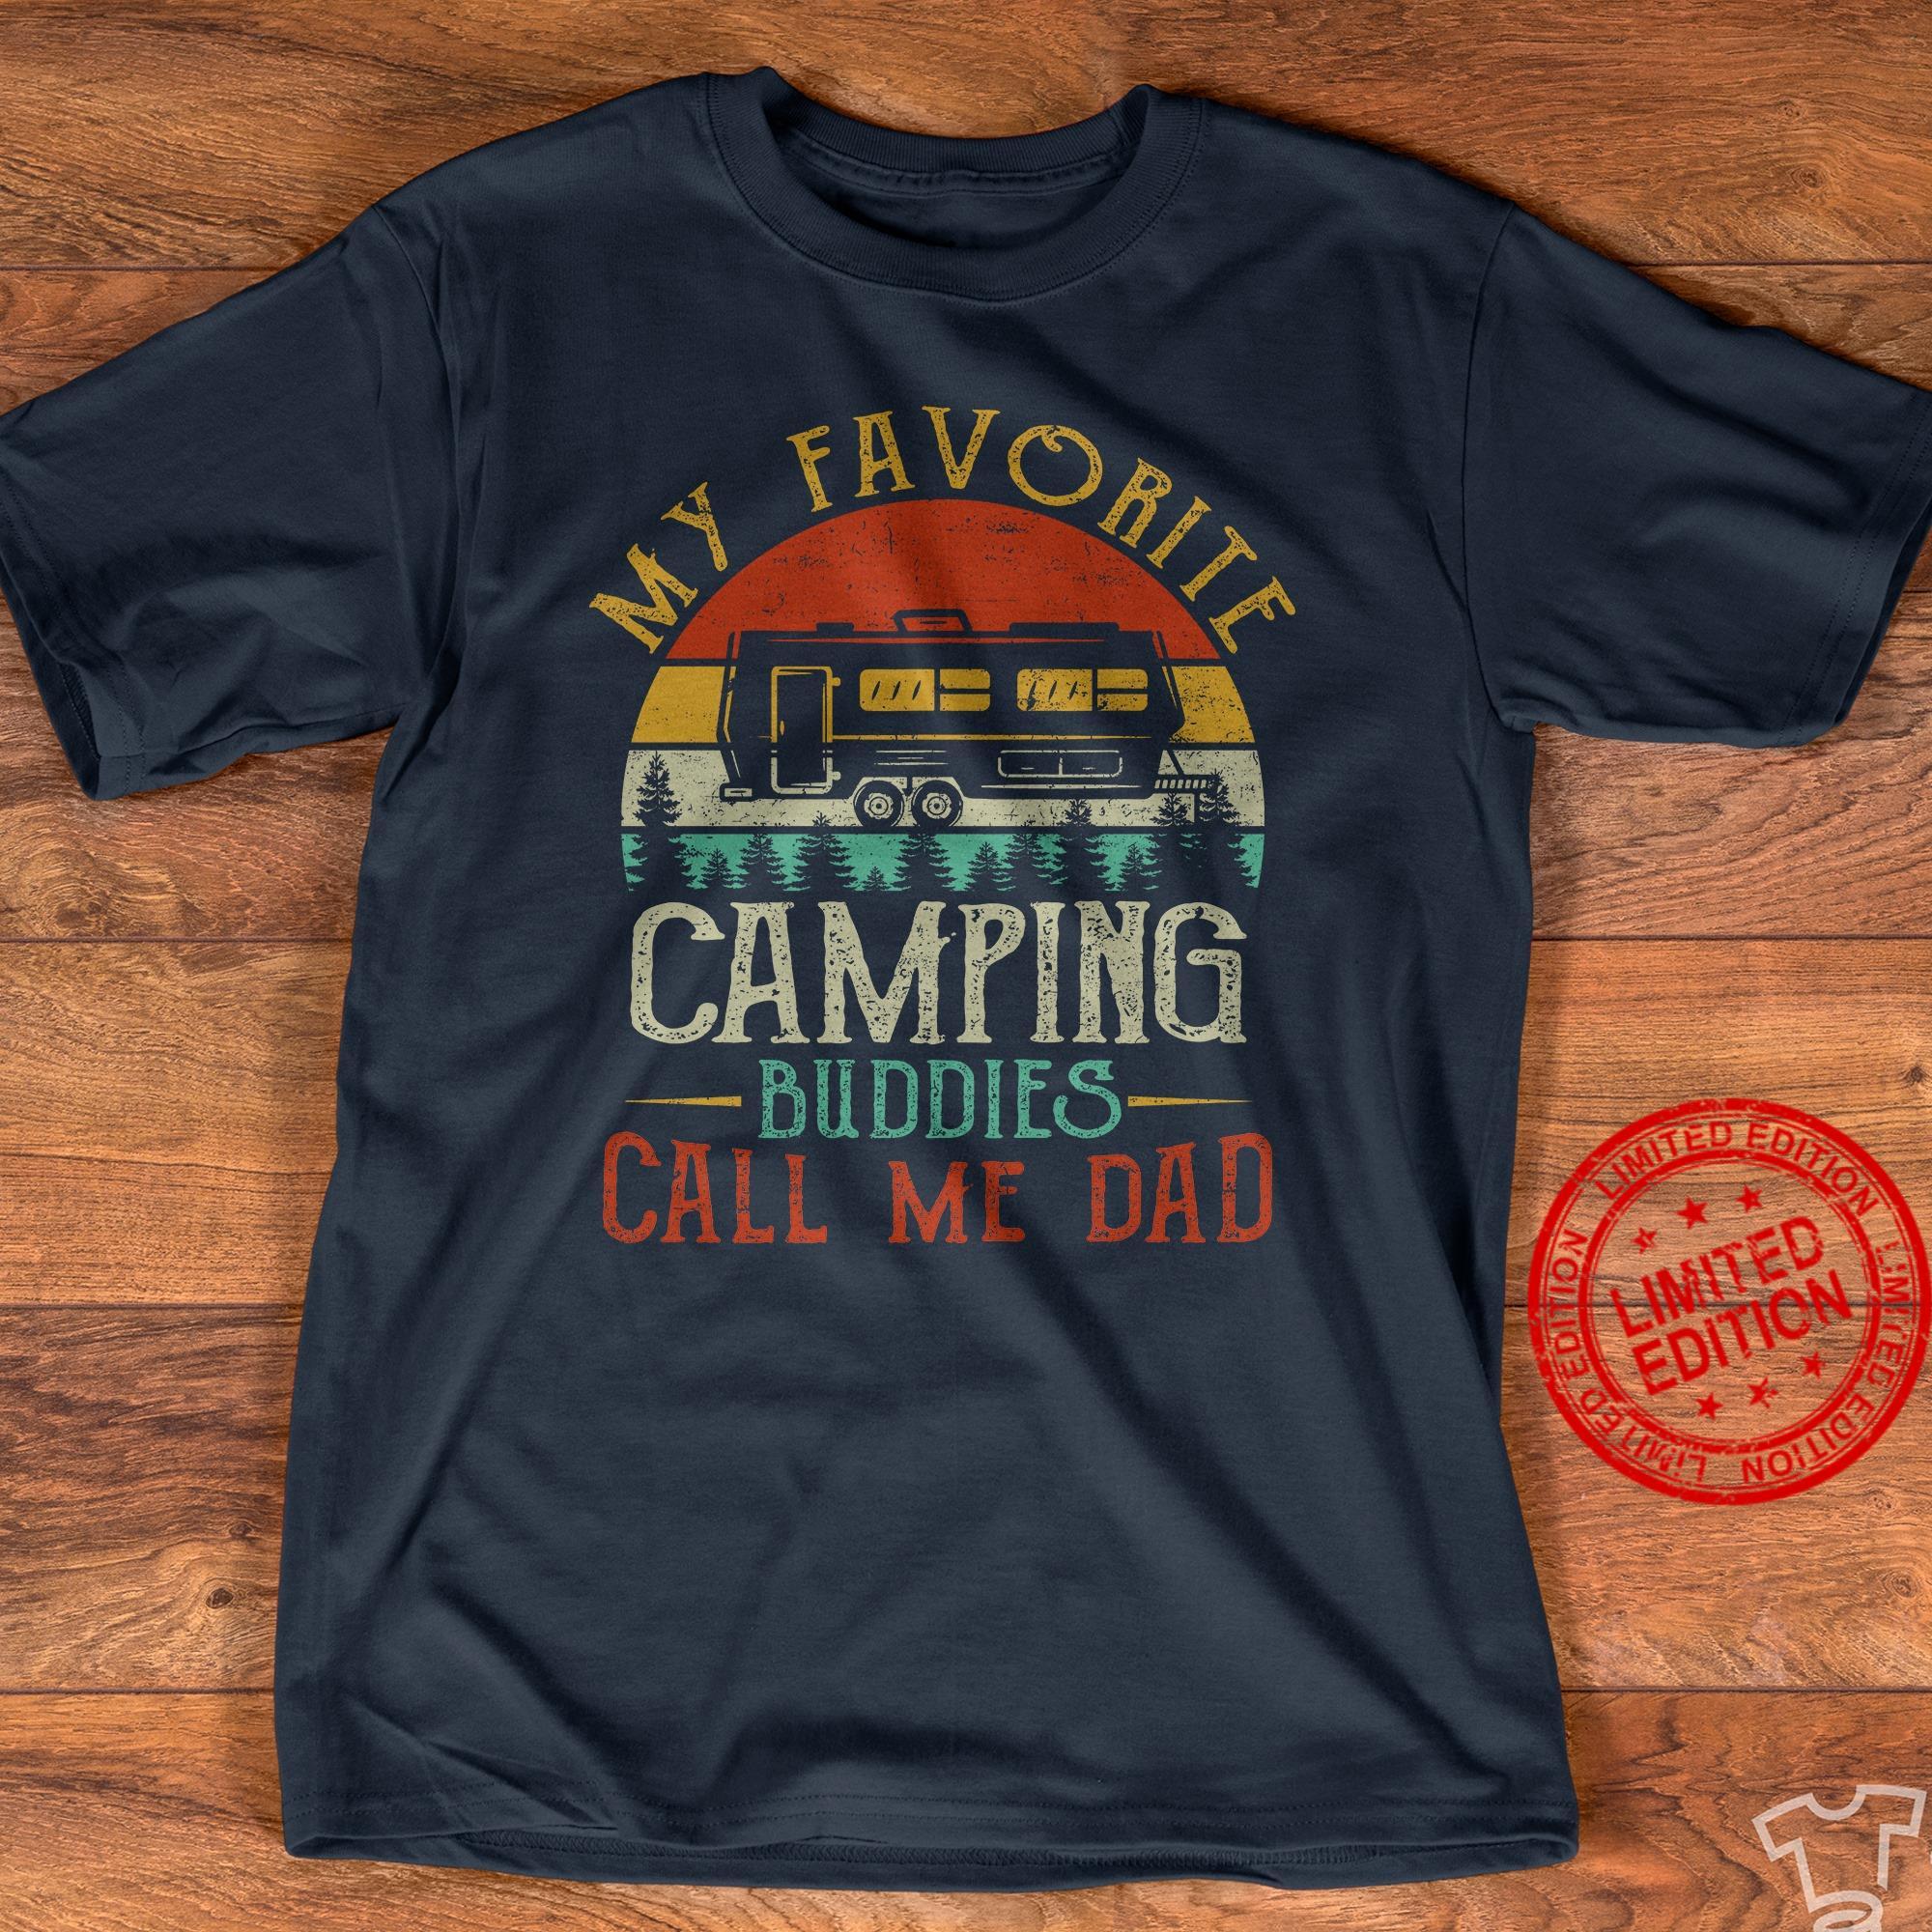 My Favorite Camping Buddies Call Me Dad Shirt